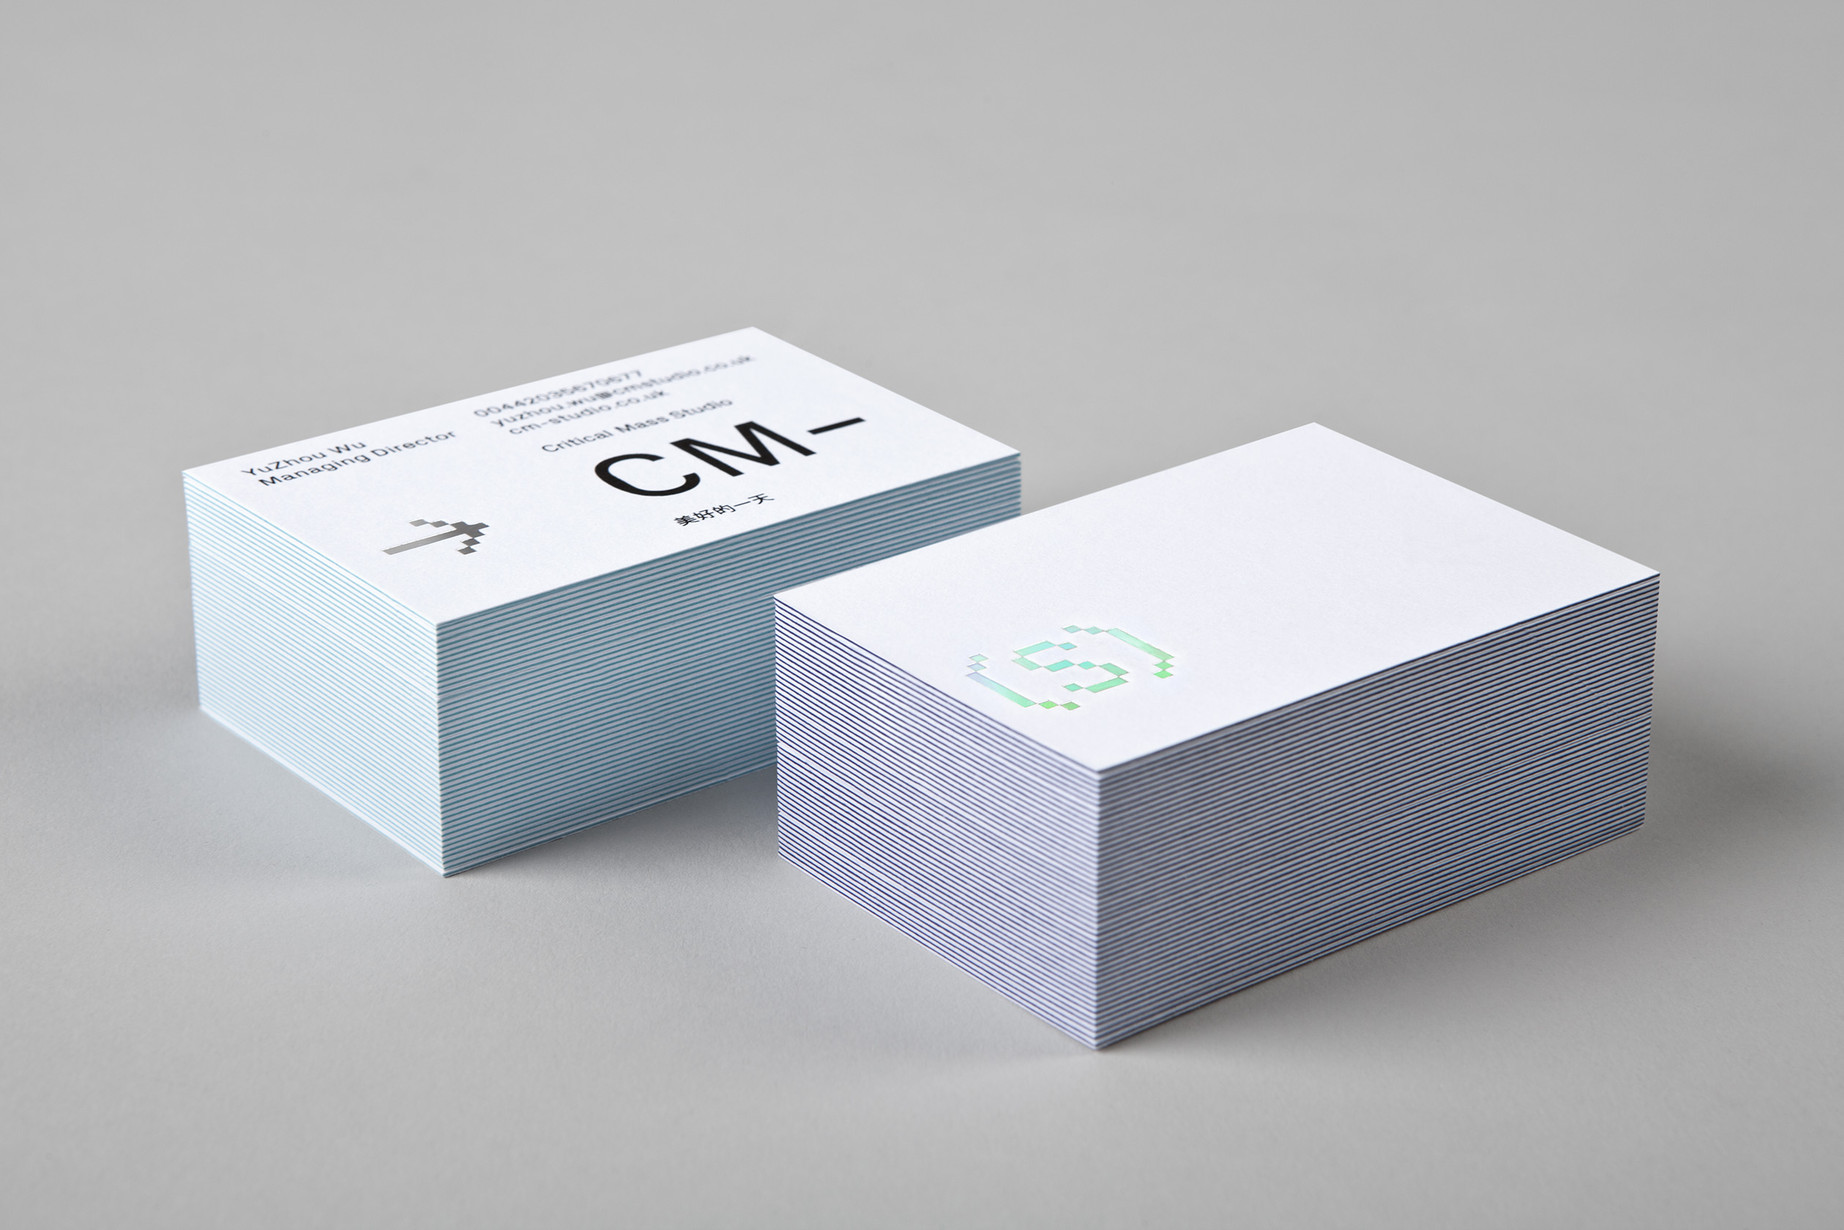 Critical Mass Studio / Lundgren & Lindqvist (4)